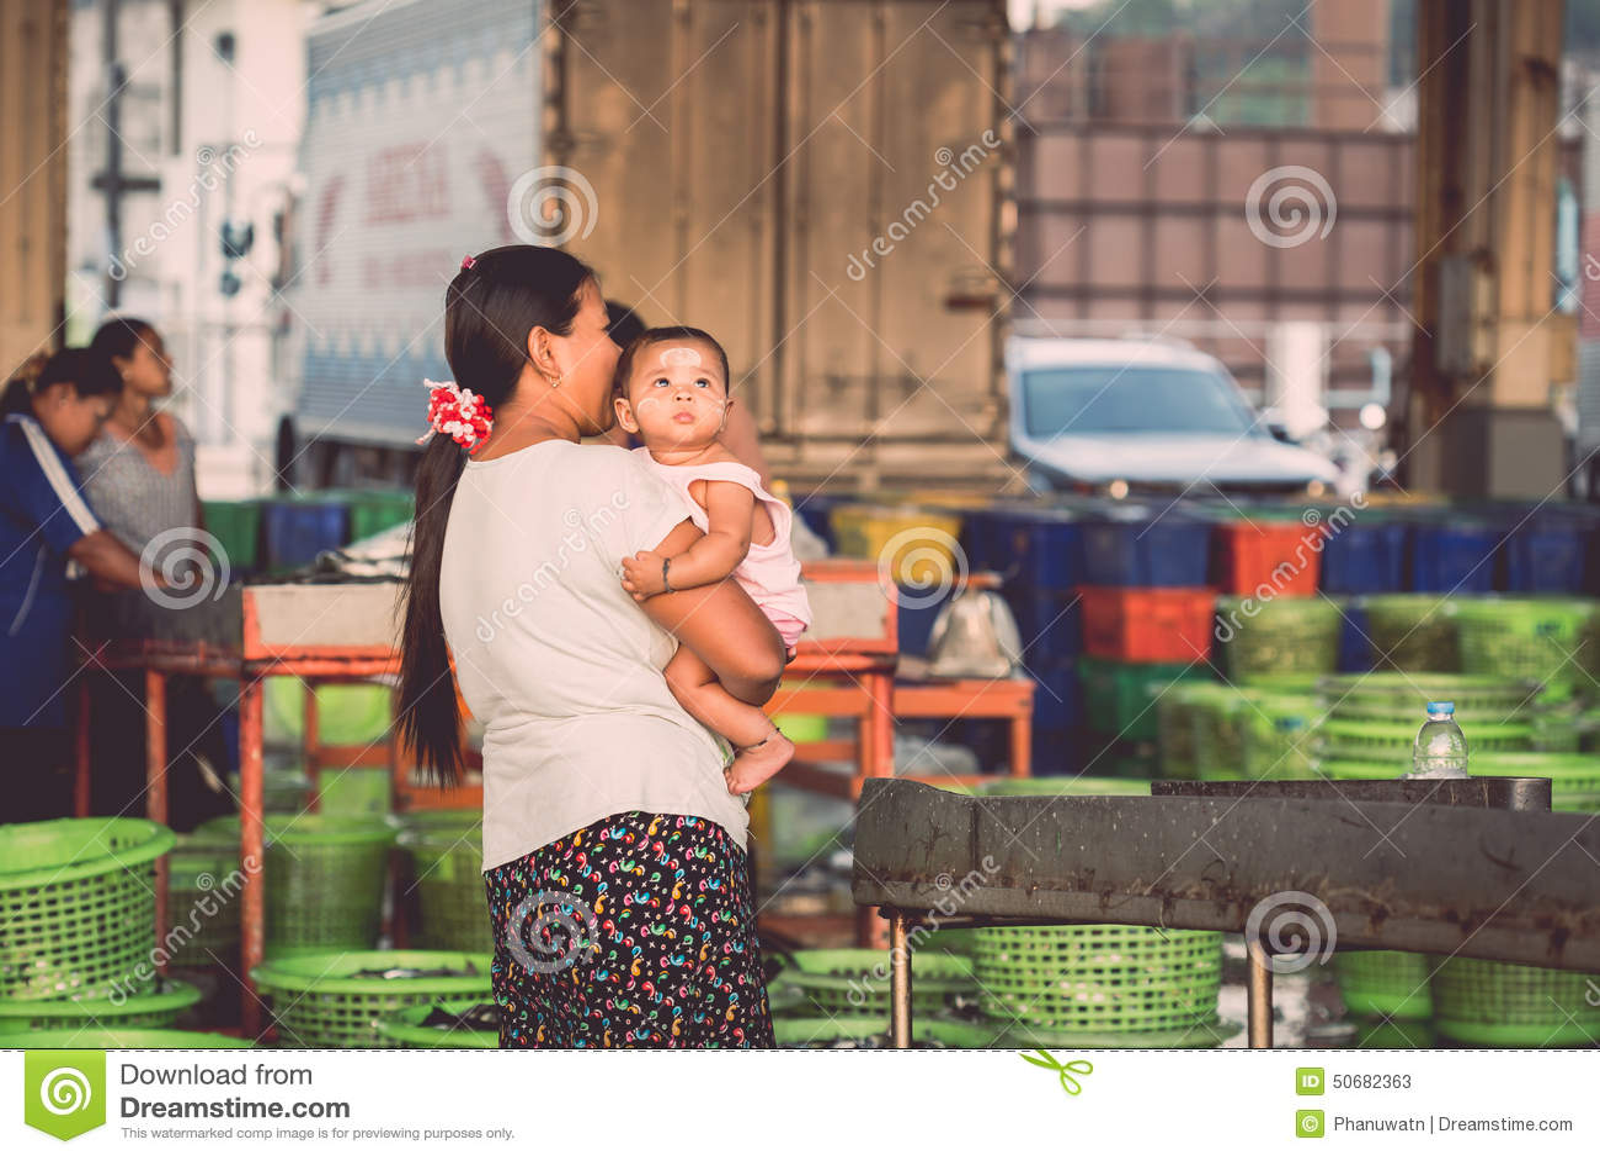 Download 普吉岛- 2月23 :缅甸人民在鱼市上工作 编辑类库存照片. 图片 包括有 沙子, 泰国, 都市, 游人 - 50682363